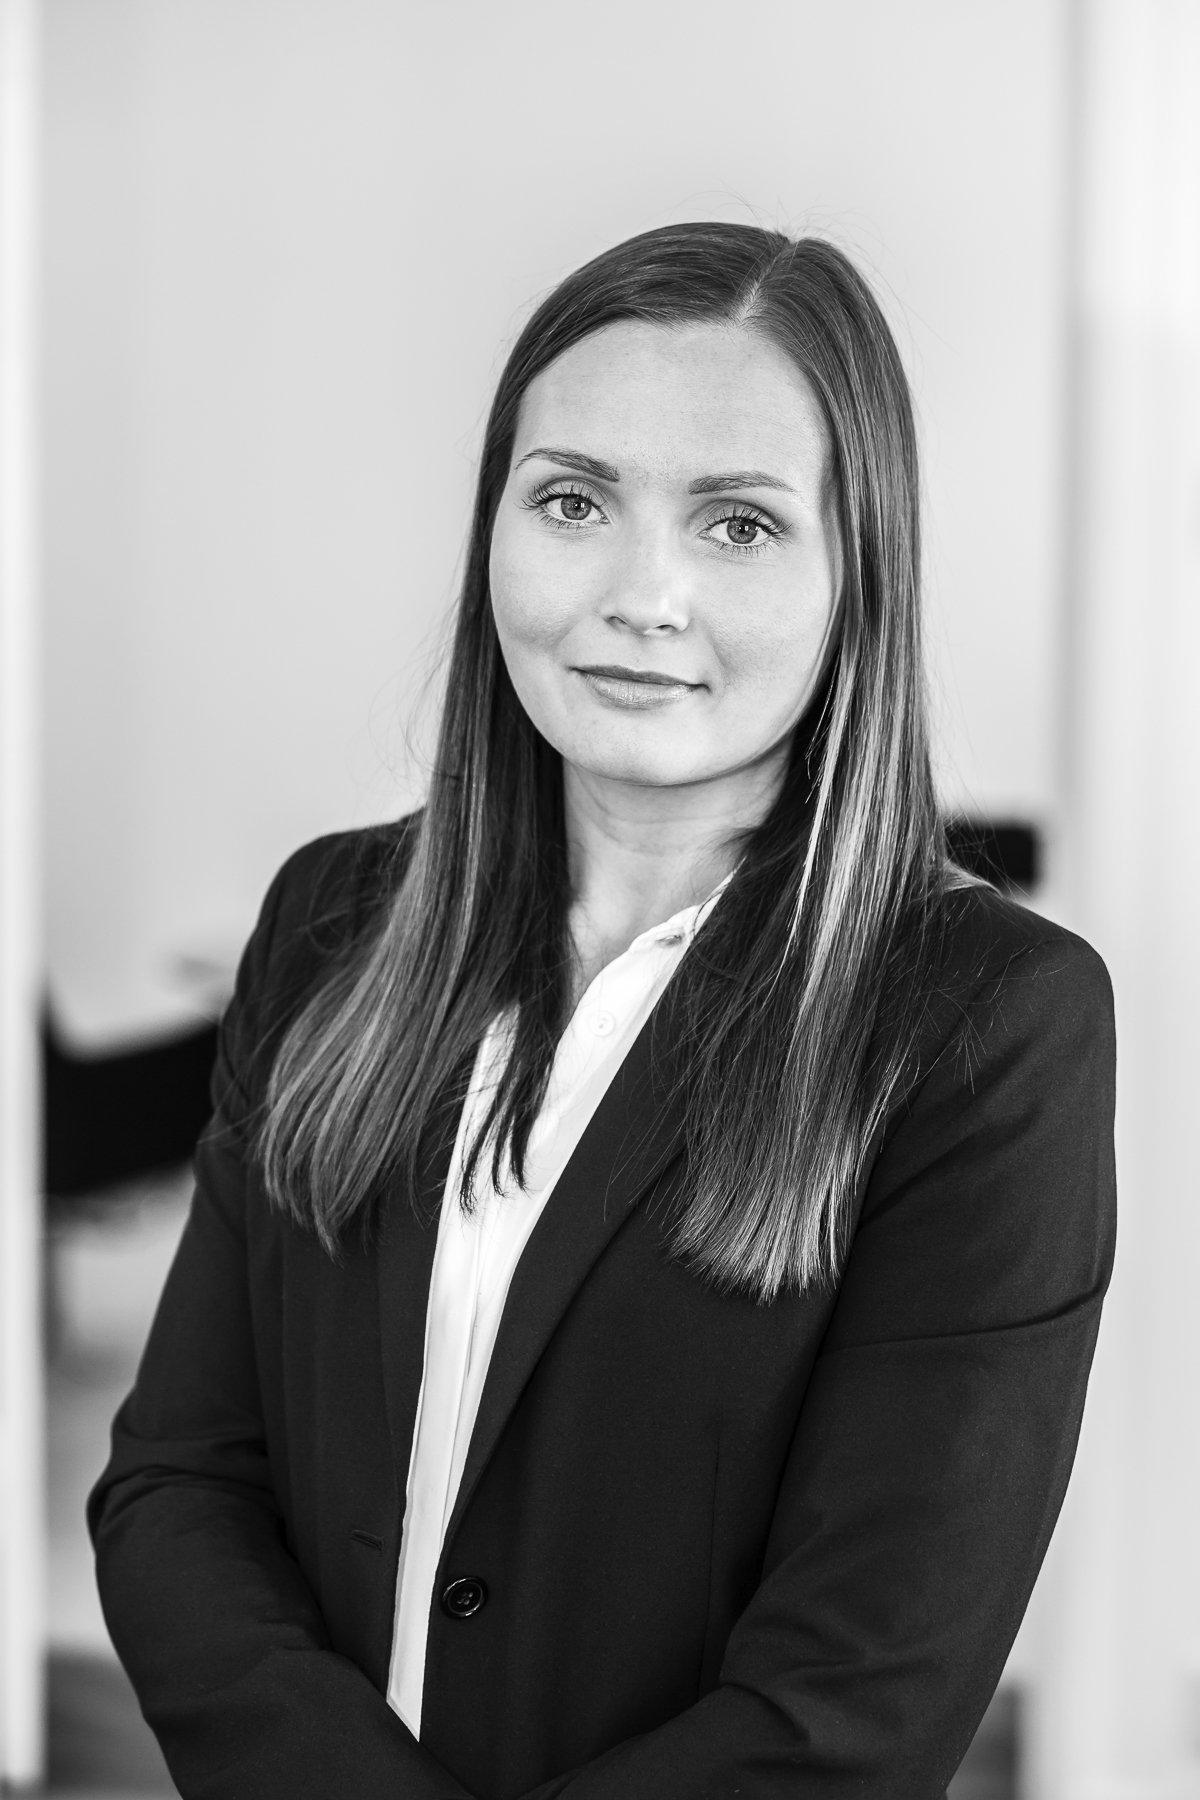 Jenny Gunnarsson